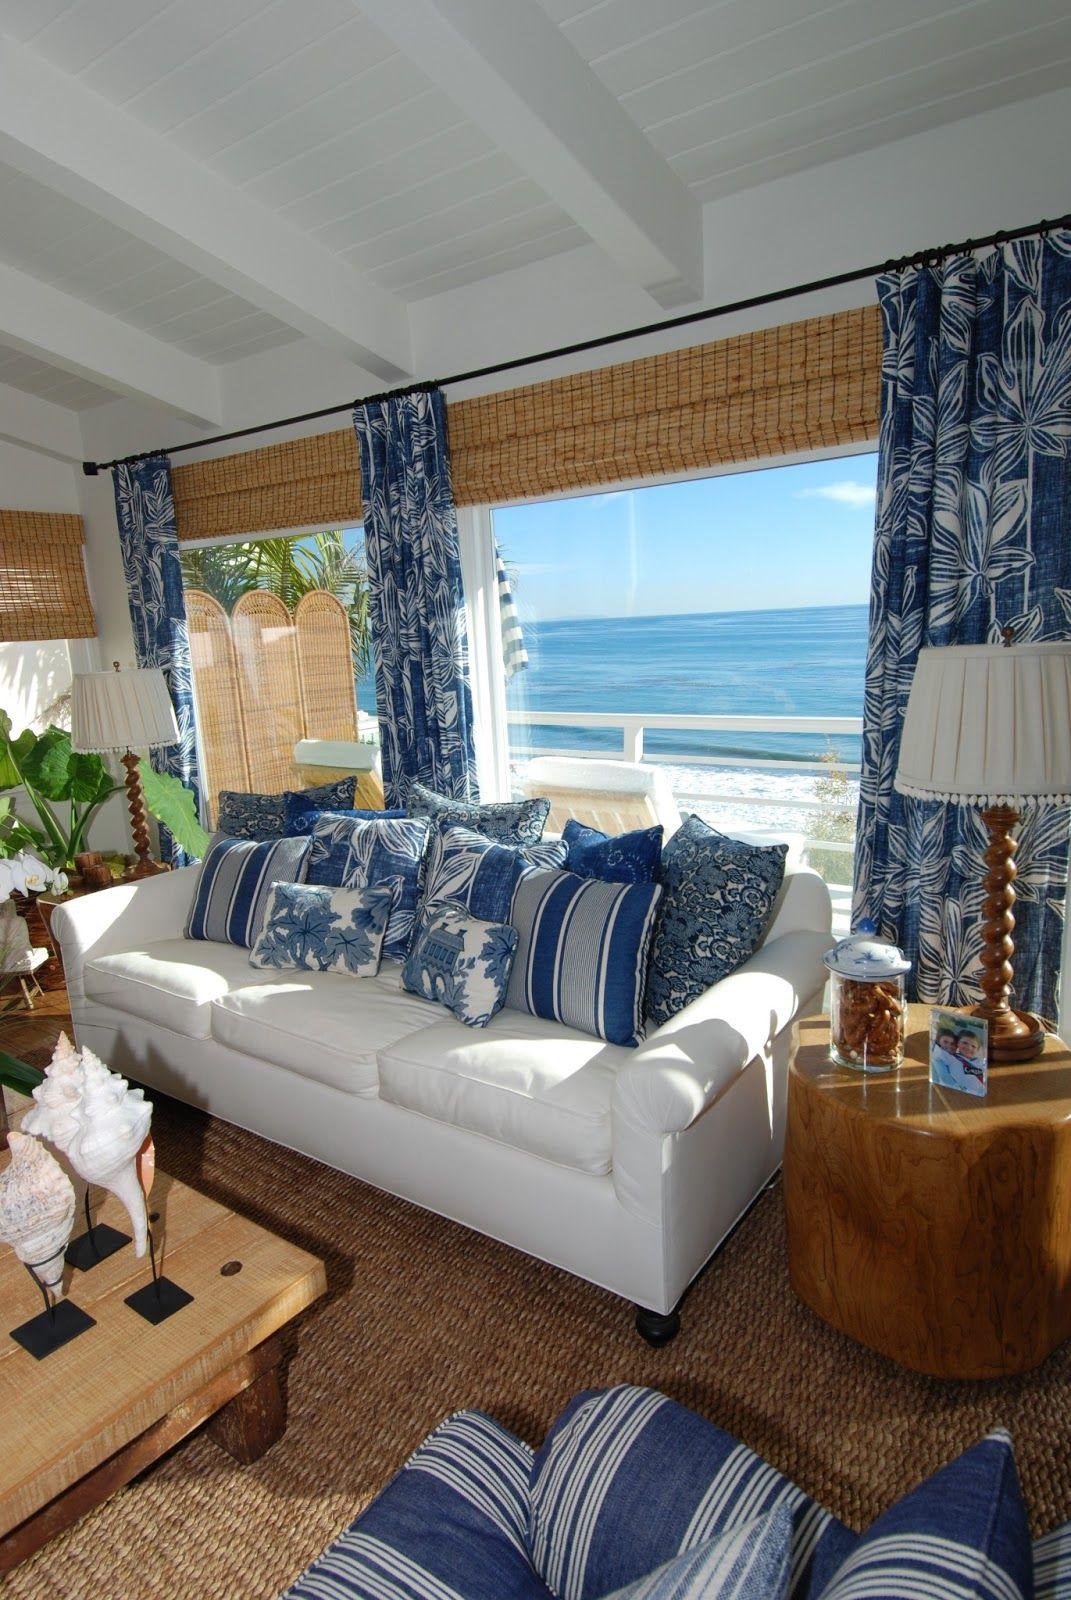 terrific beach house living room furniture   Everything Coastal....: Sea Blue and White - Always a ...